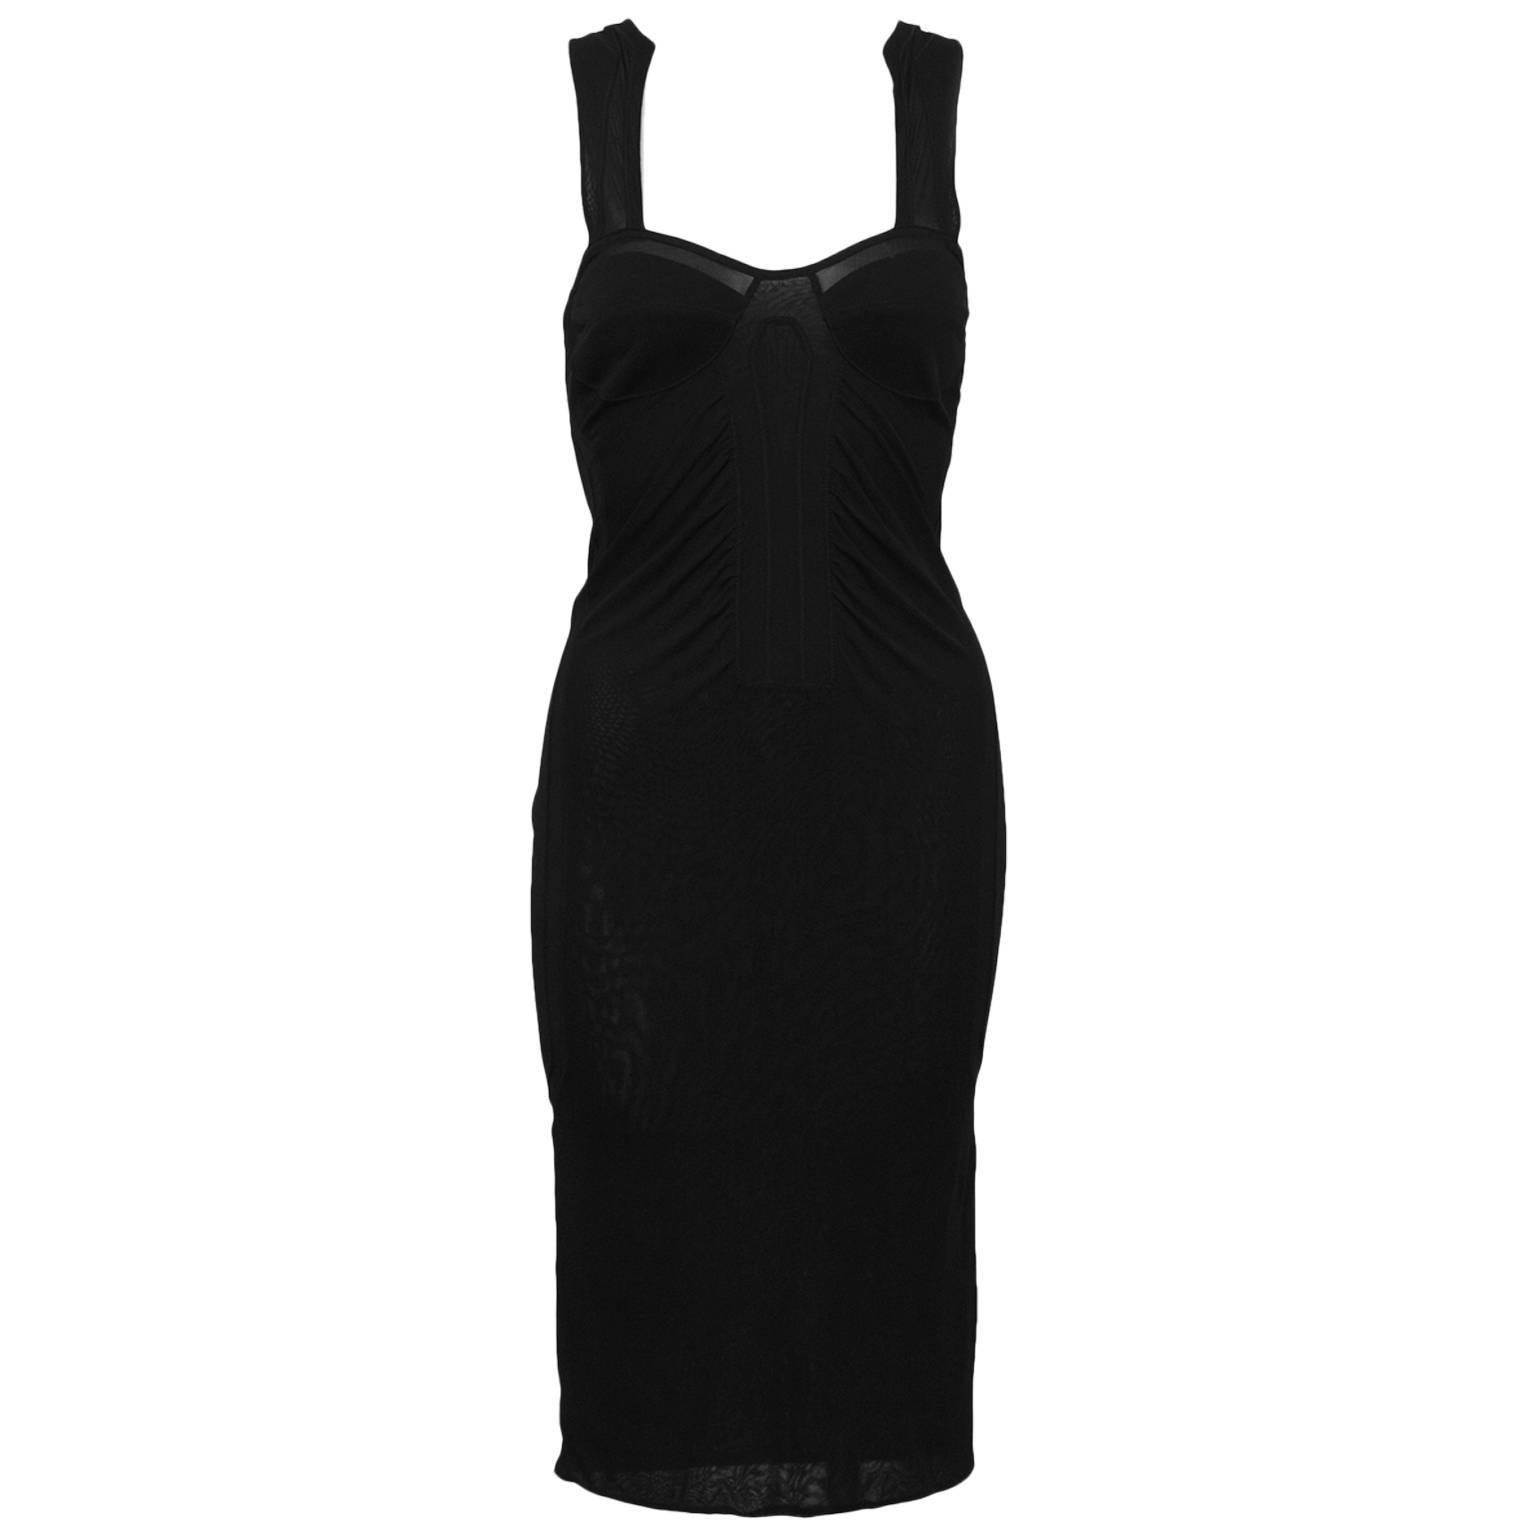 2000's Gucci Black Mesh Dress